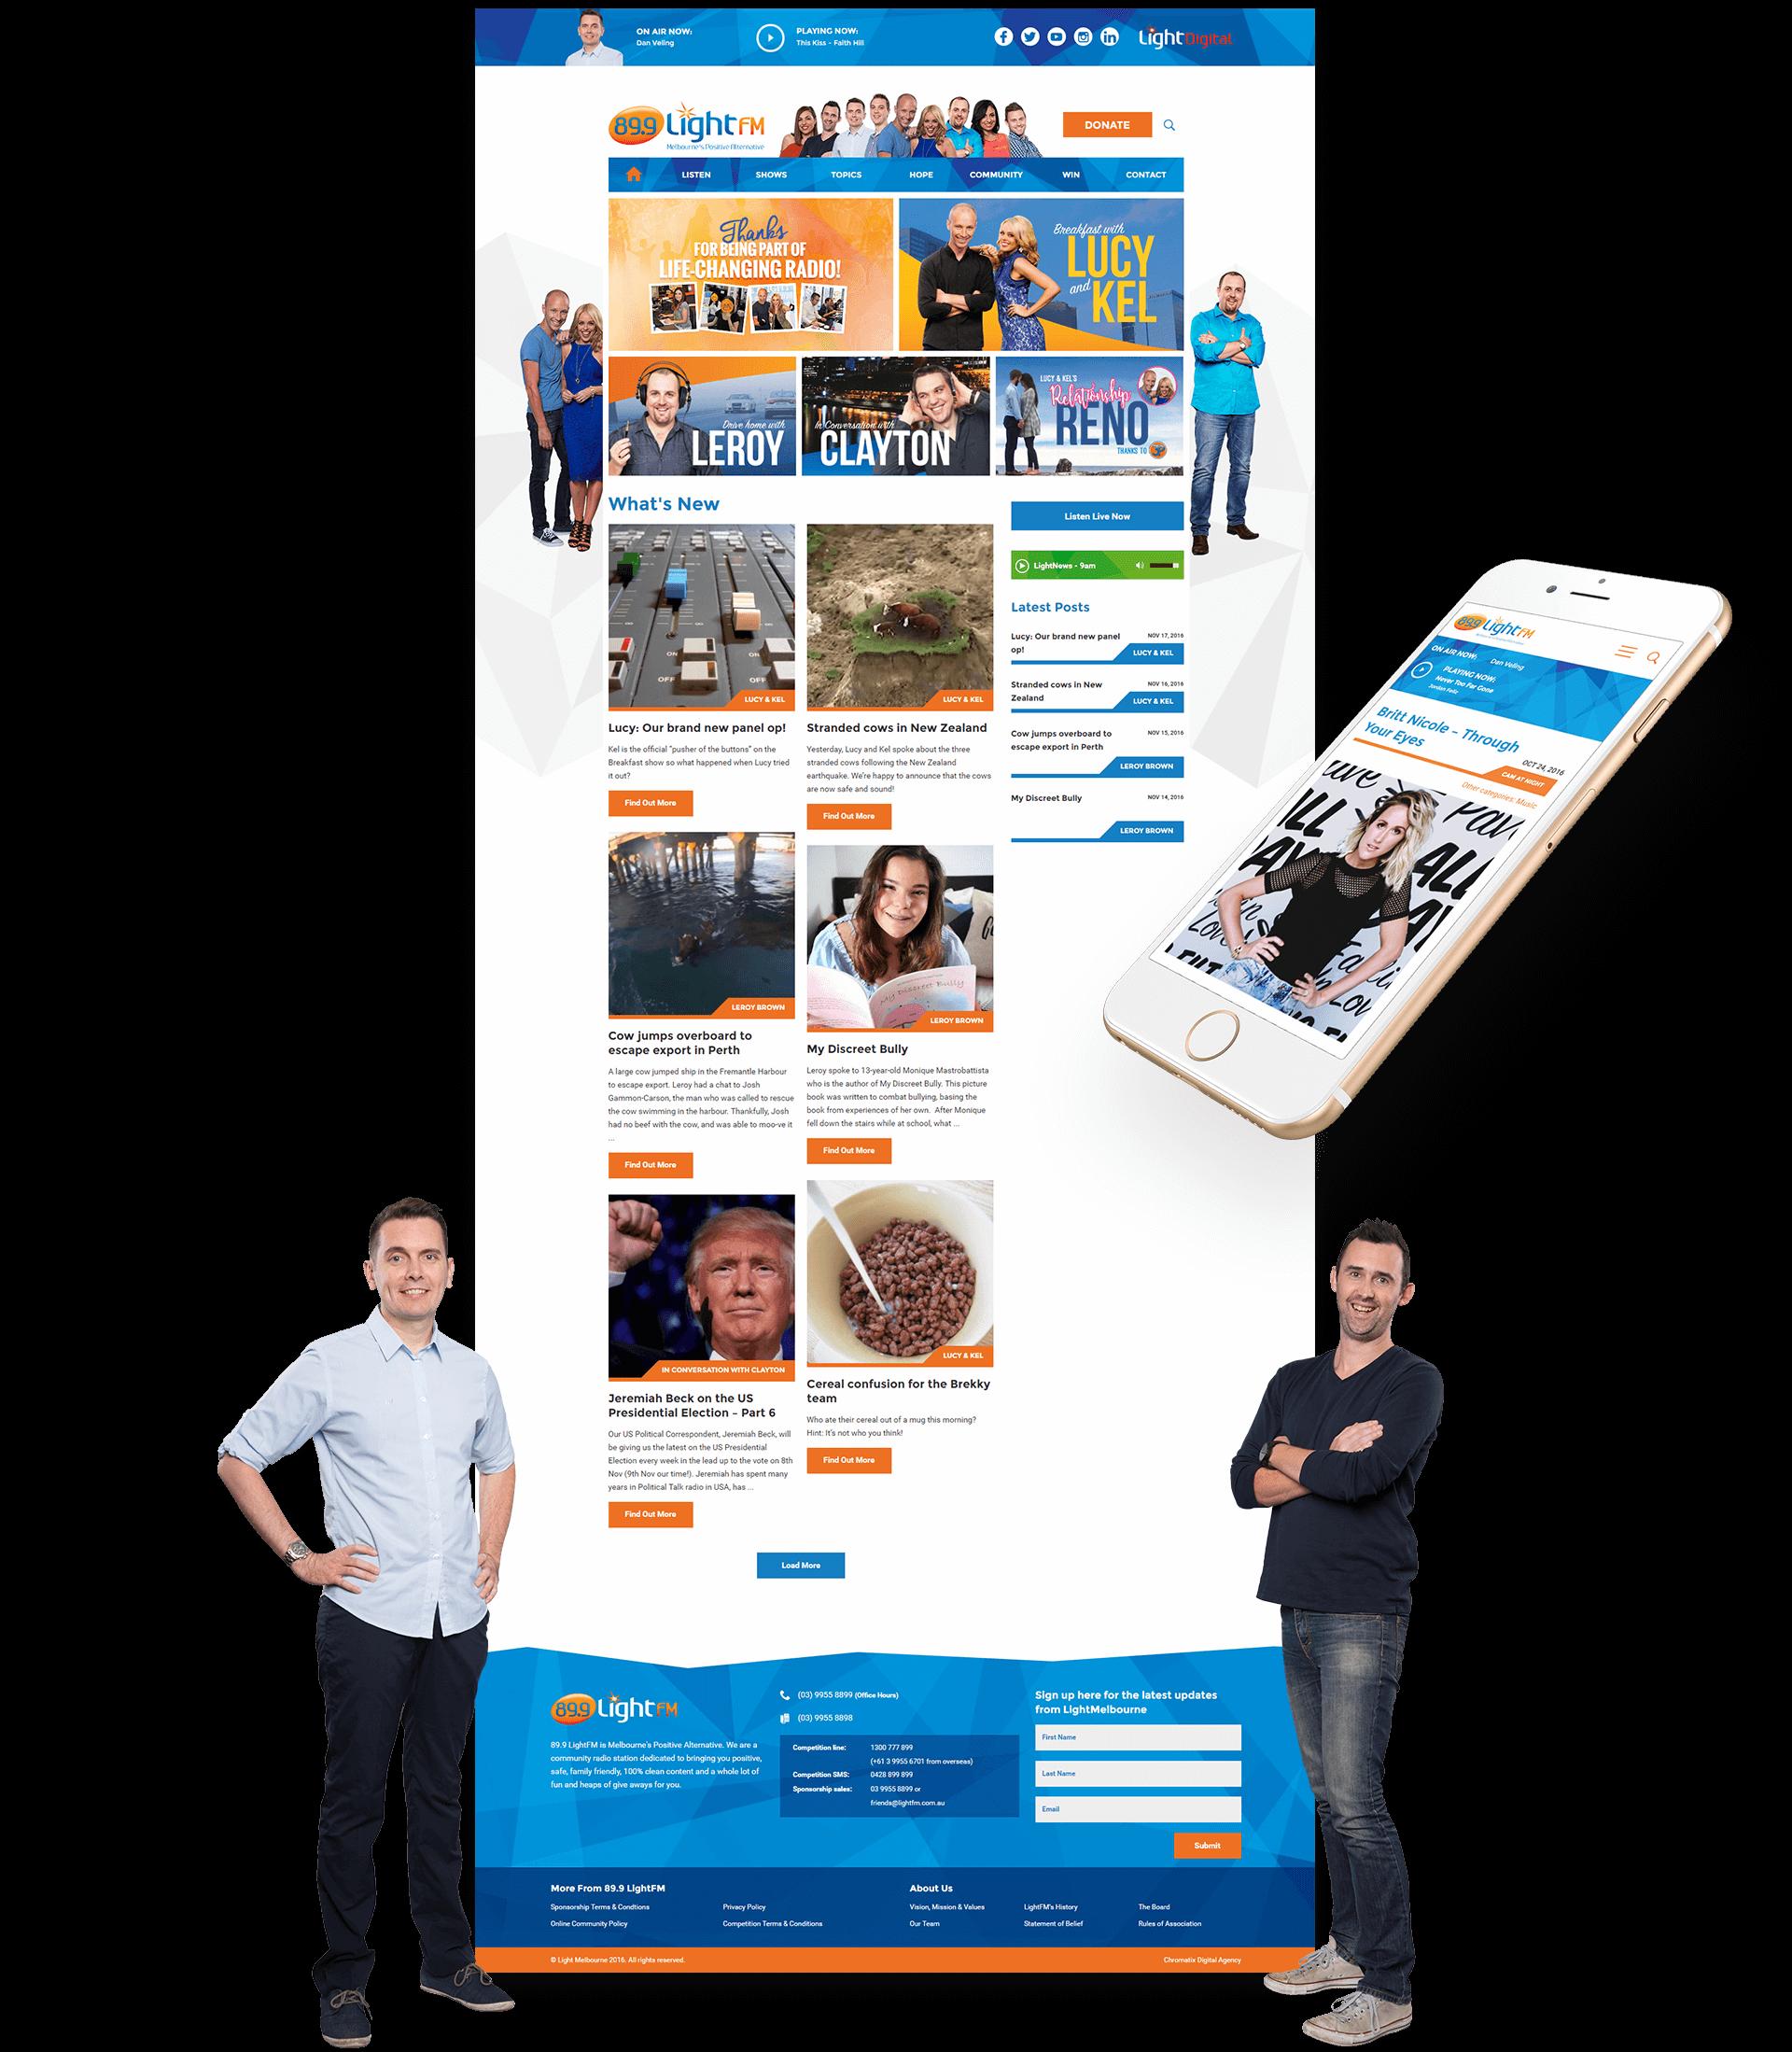 Desktop and Mobile Views of LightFM Website Showcasing Articles